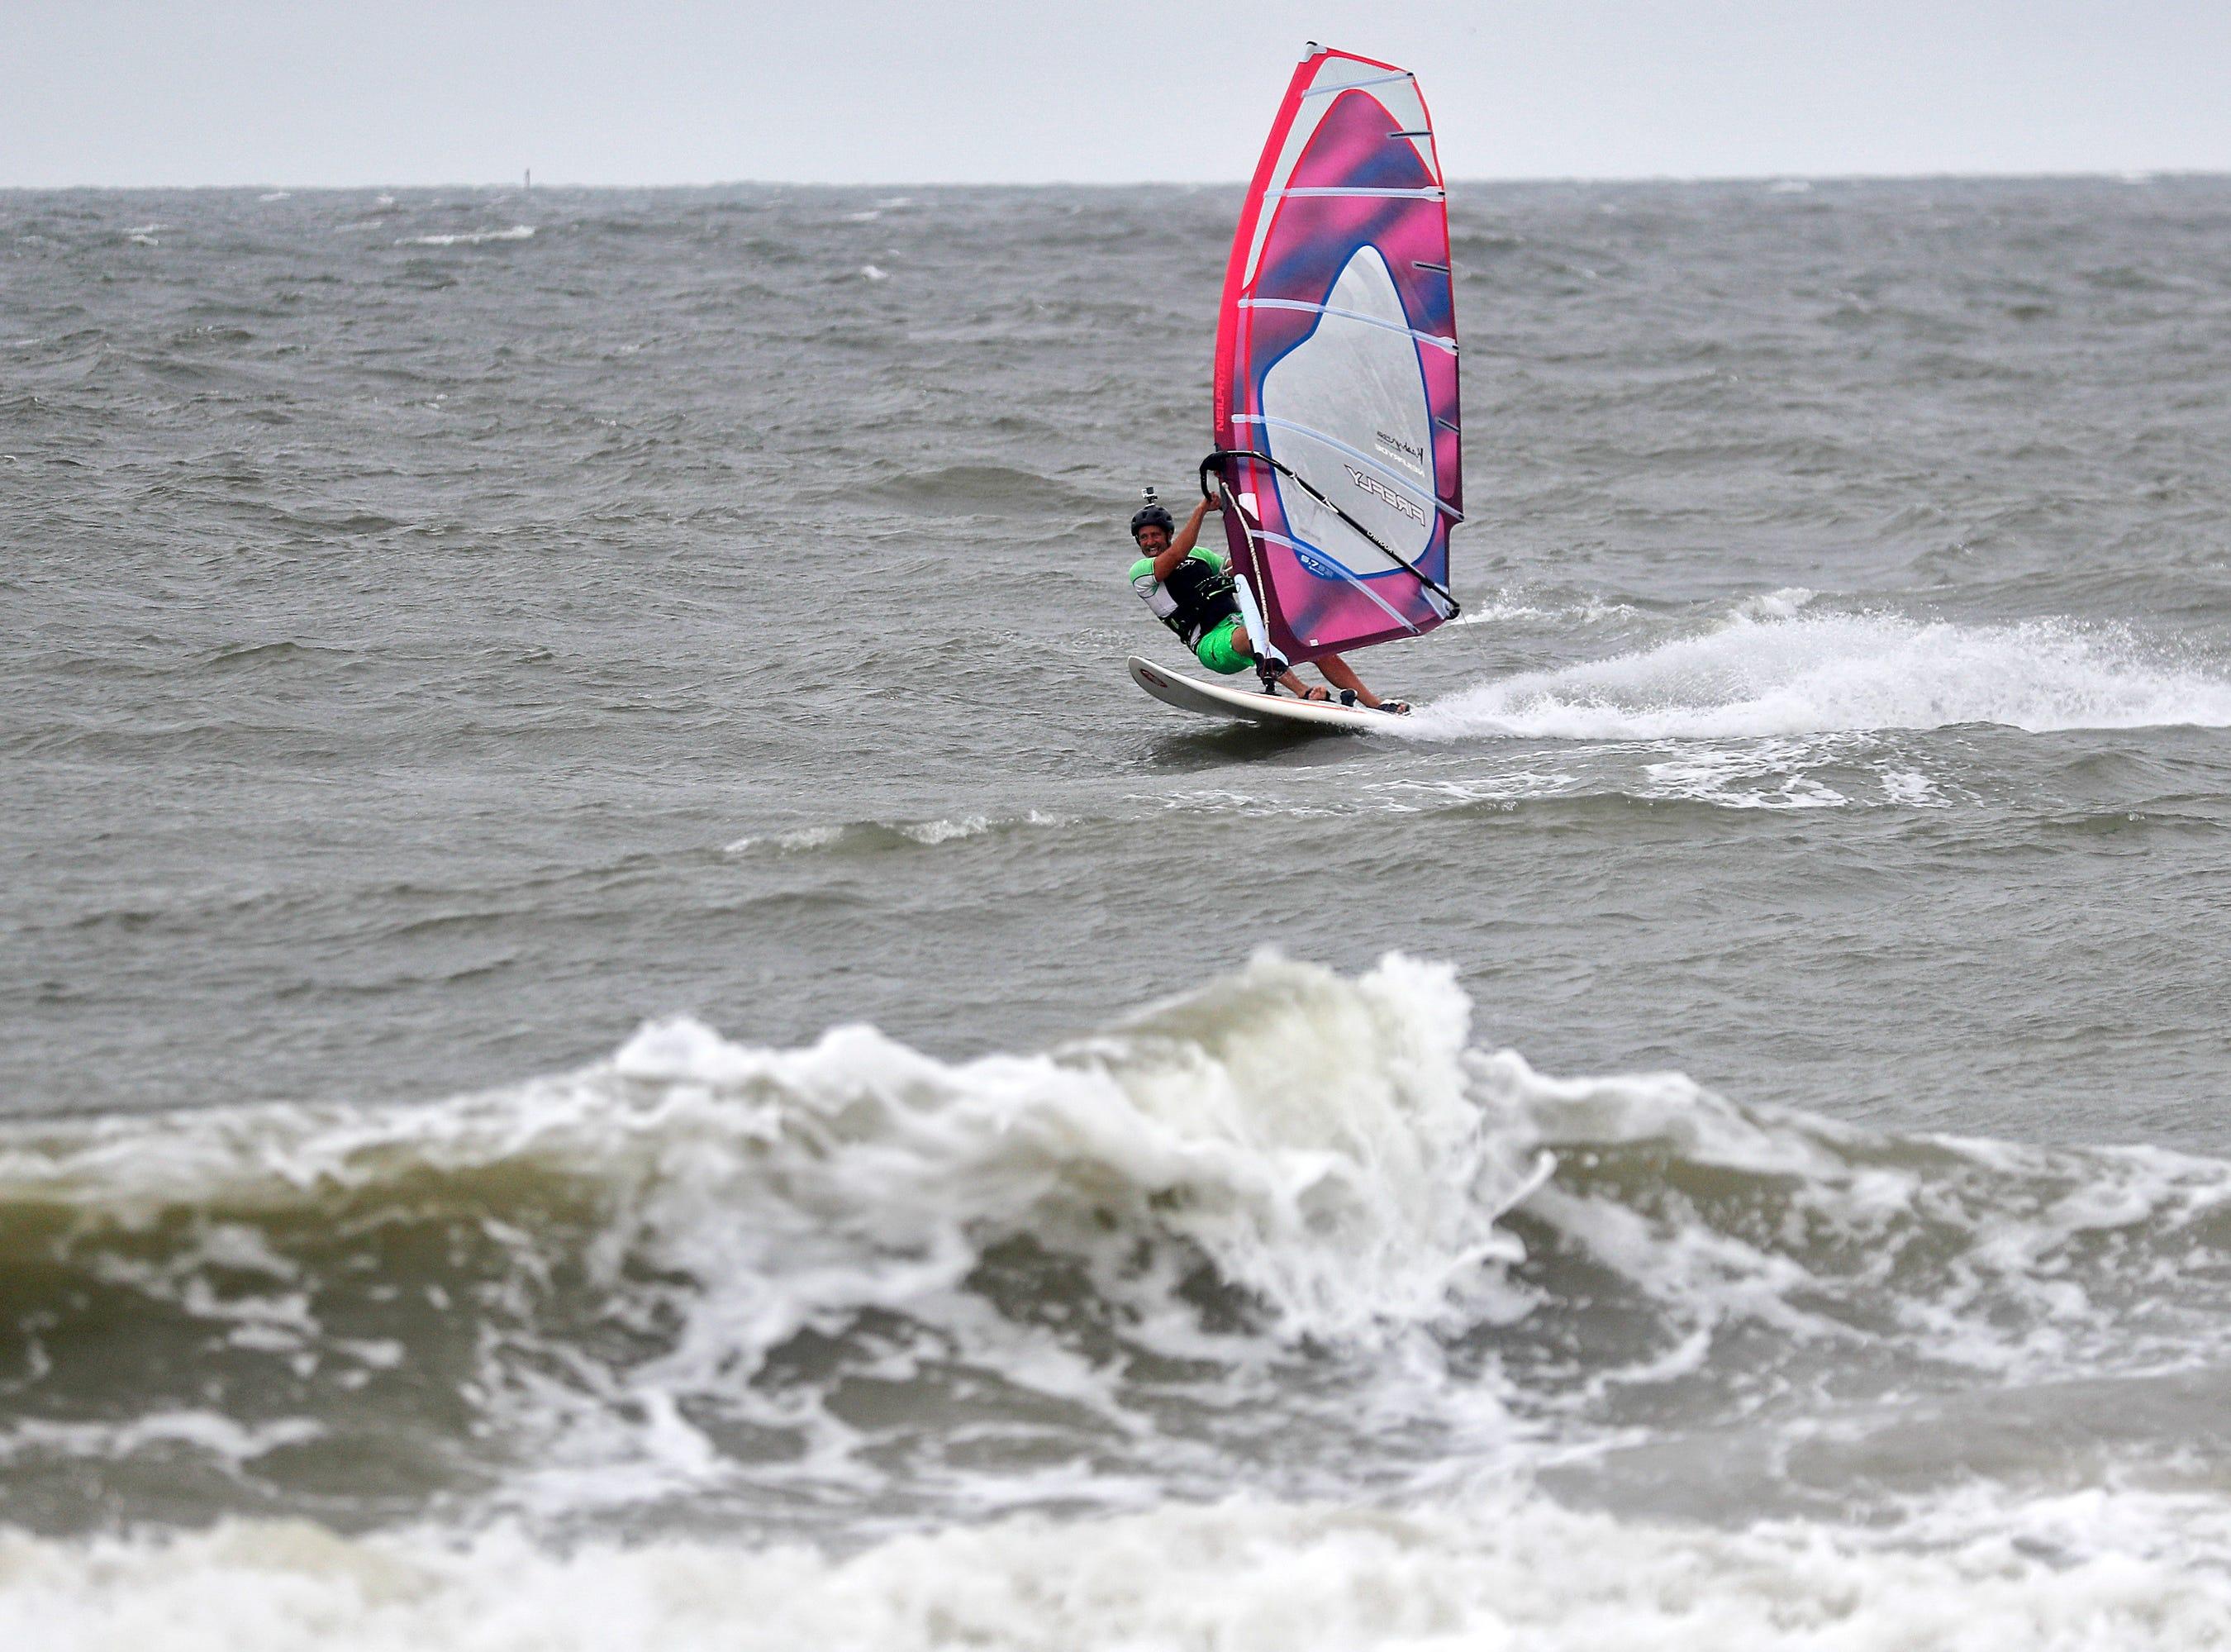 Keith Knight windsurfs through the waves at Buckroe Beach in Hampton, Va., Thursday, Sept. 13, 2018 as Hurricane Florence approaches the coast.